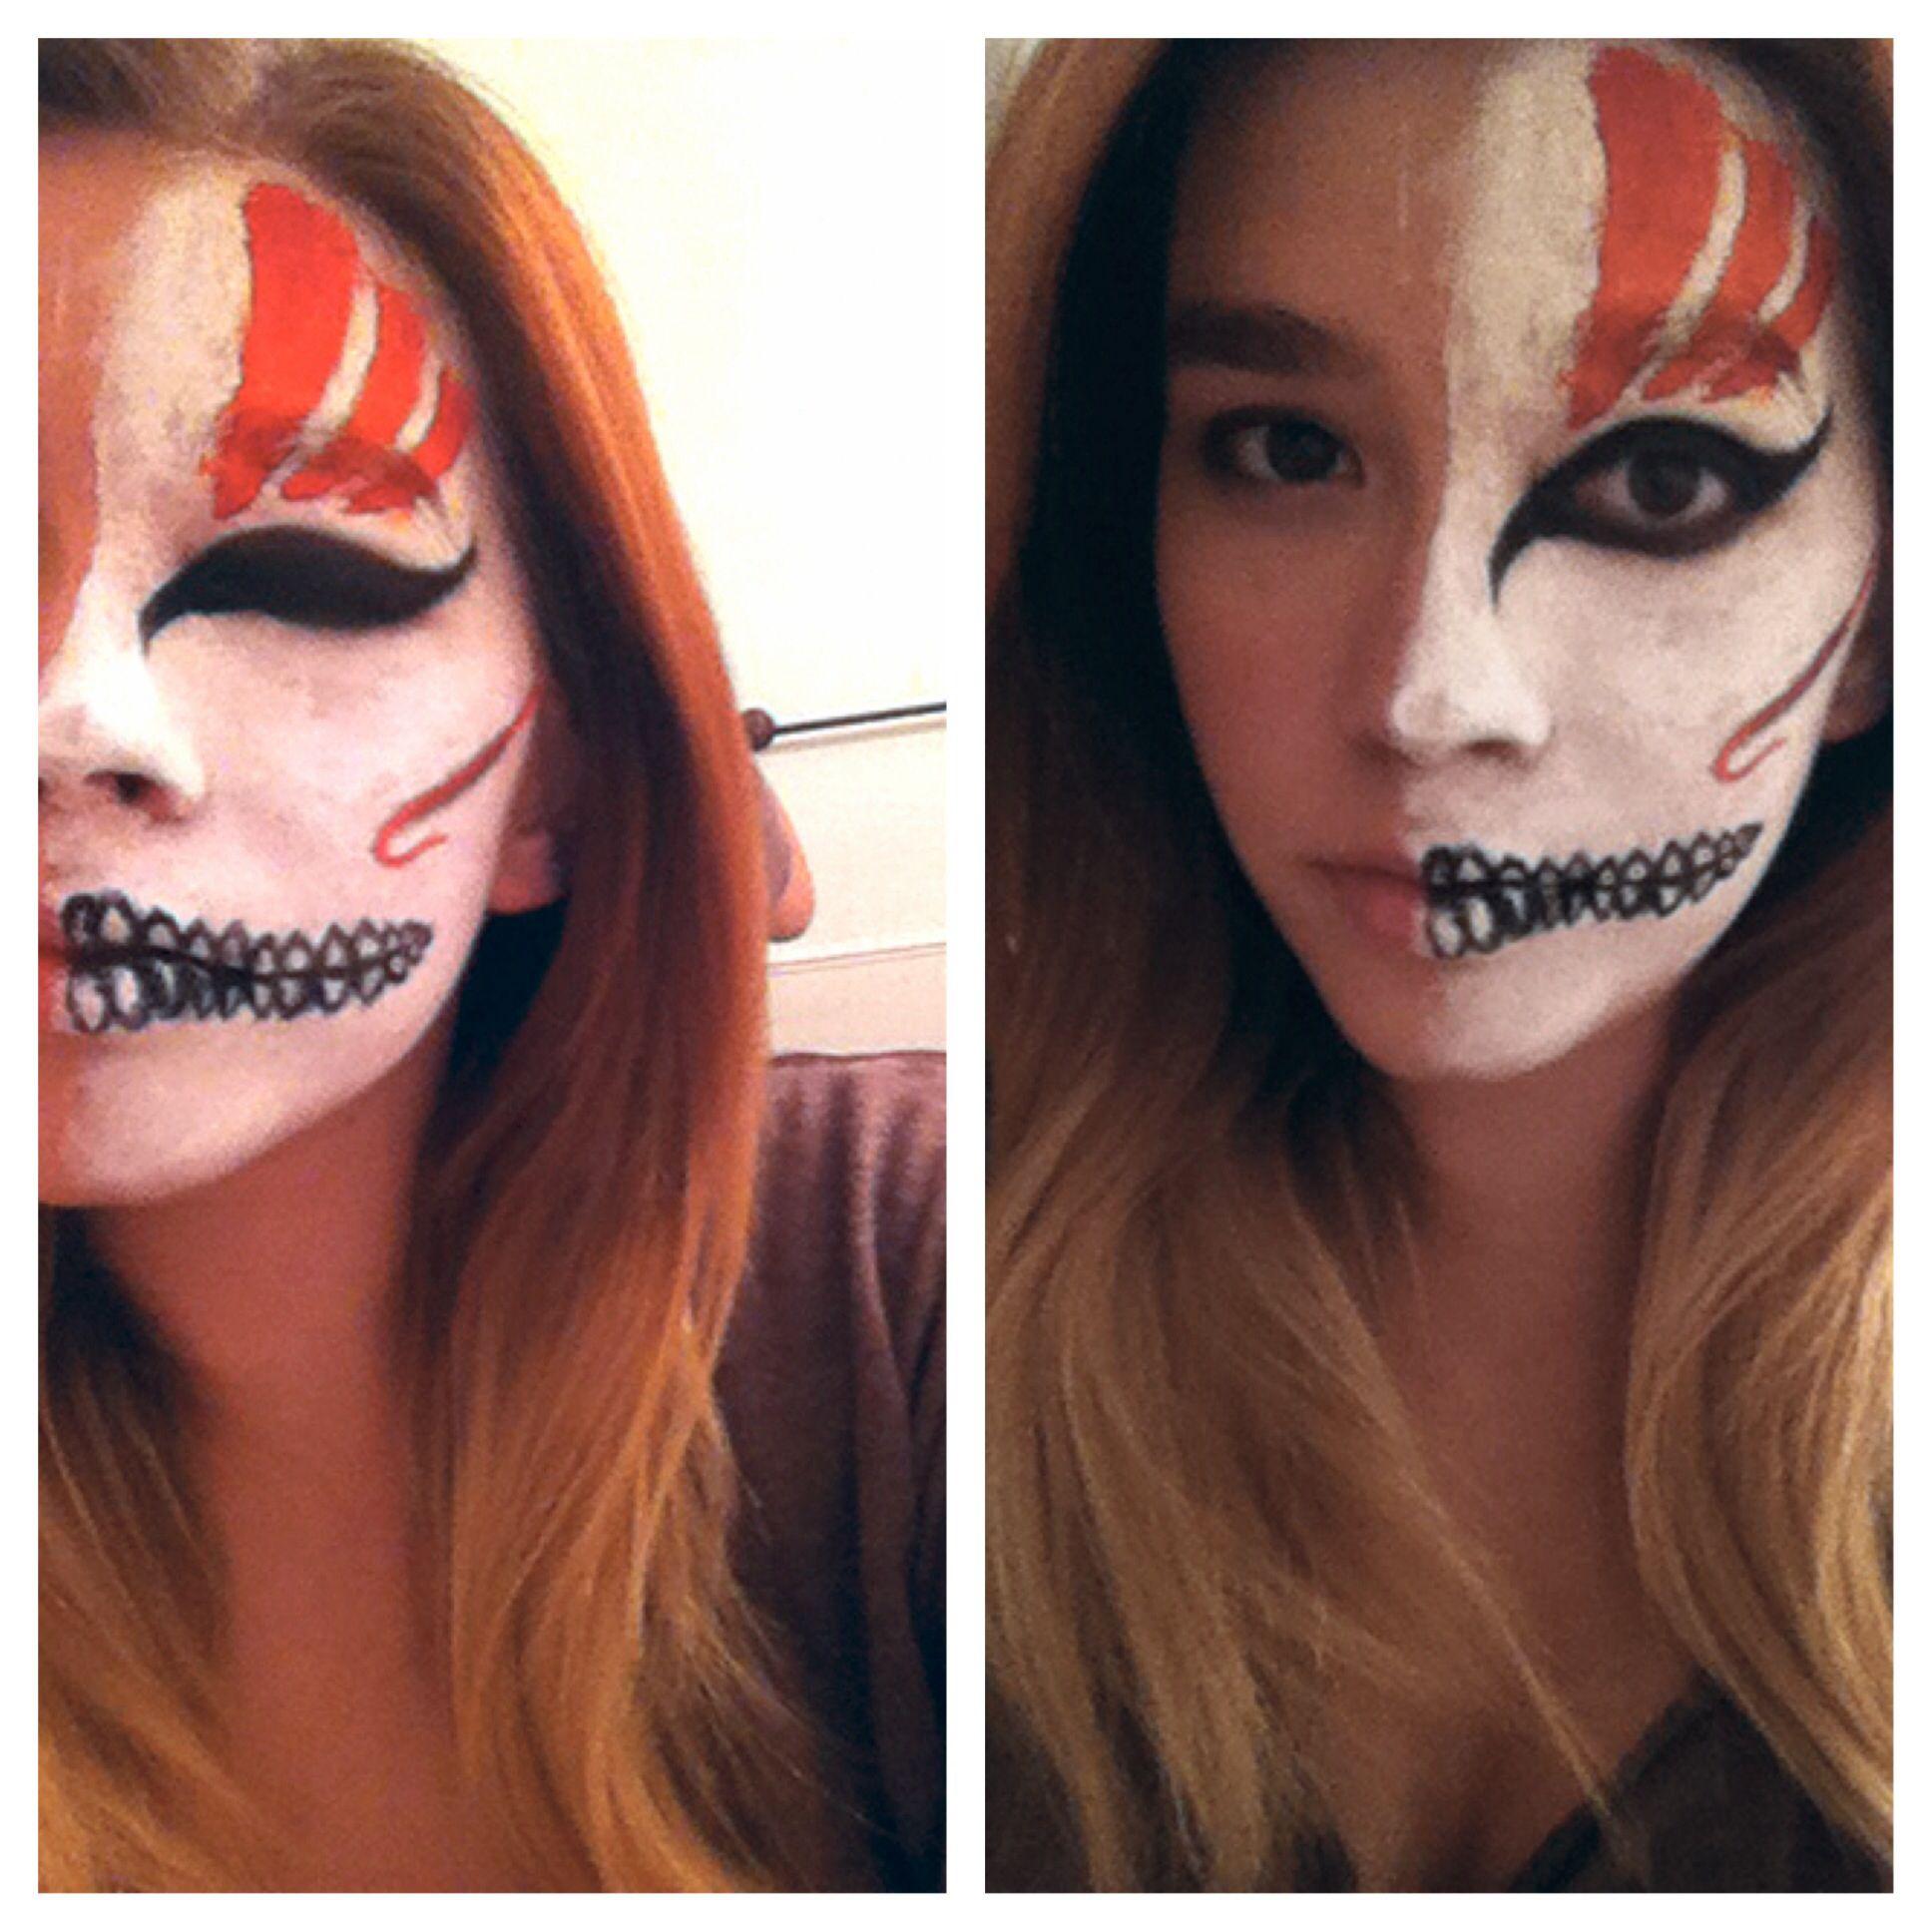 Halloween Makeup Idea Ichigo S Hollow Mask From The Anima Bleach Special Effects Makeup Makeup Face Makeup